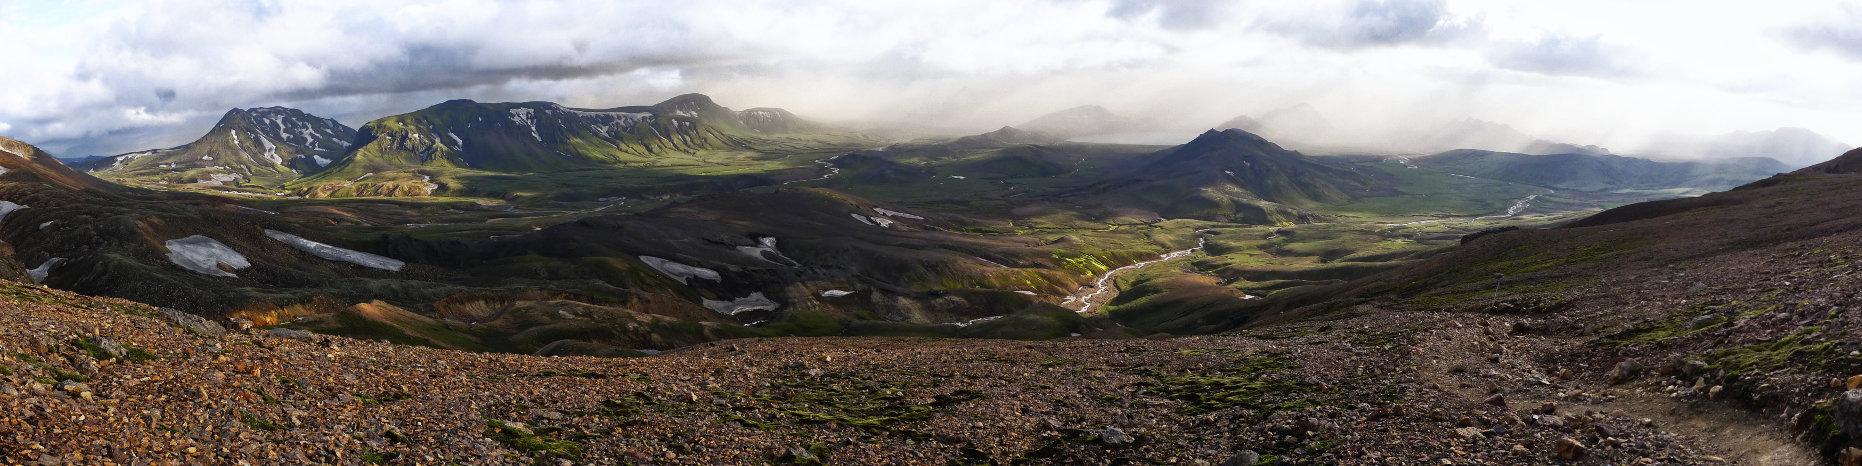 Fjallabak et le trek du Laugavegur feature image